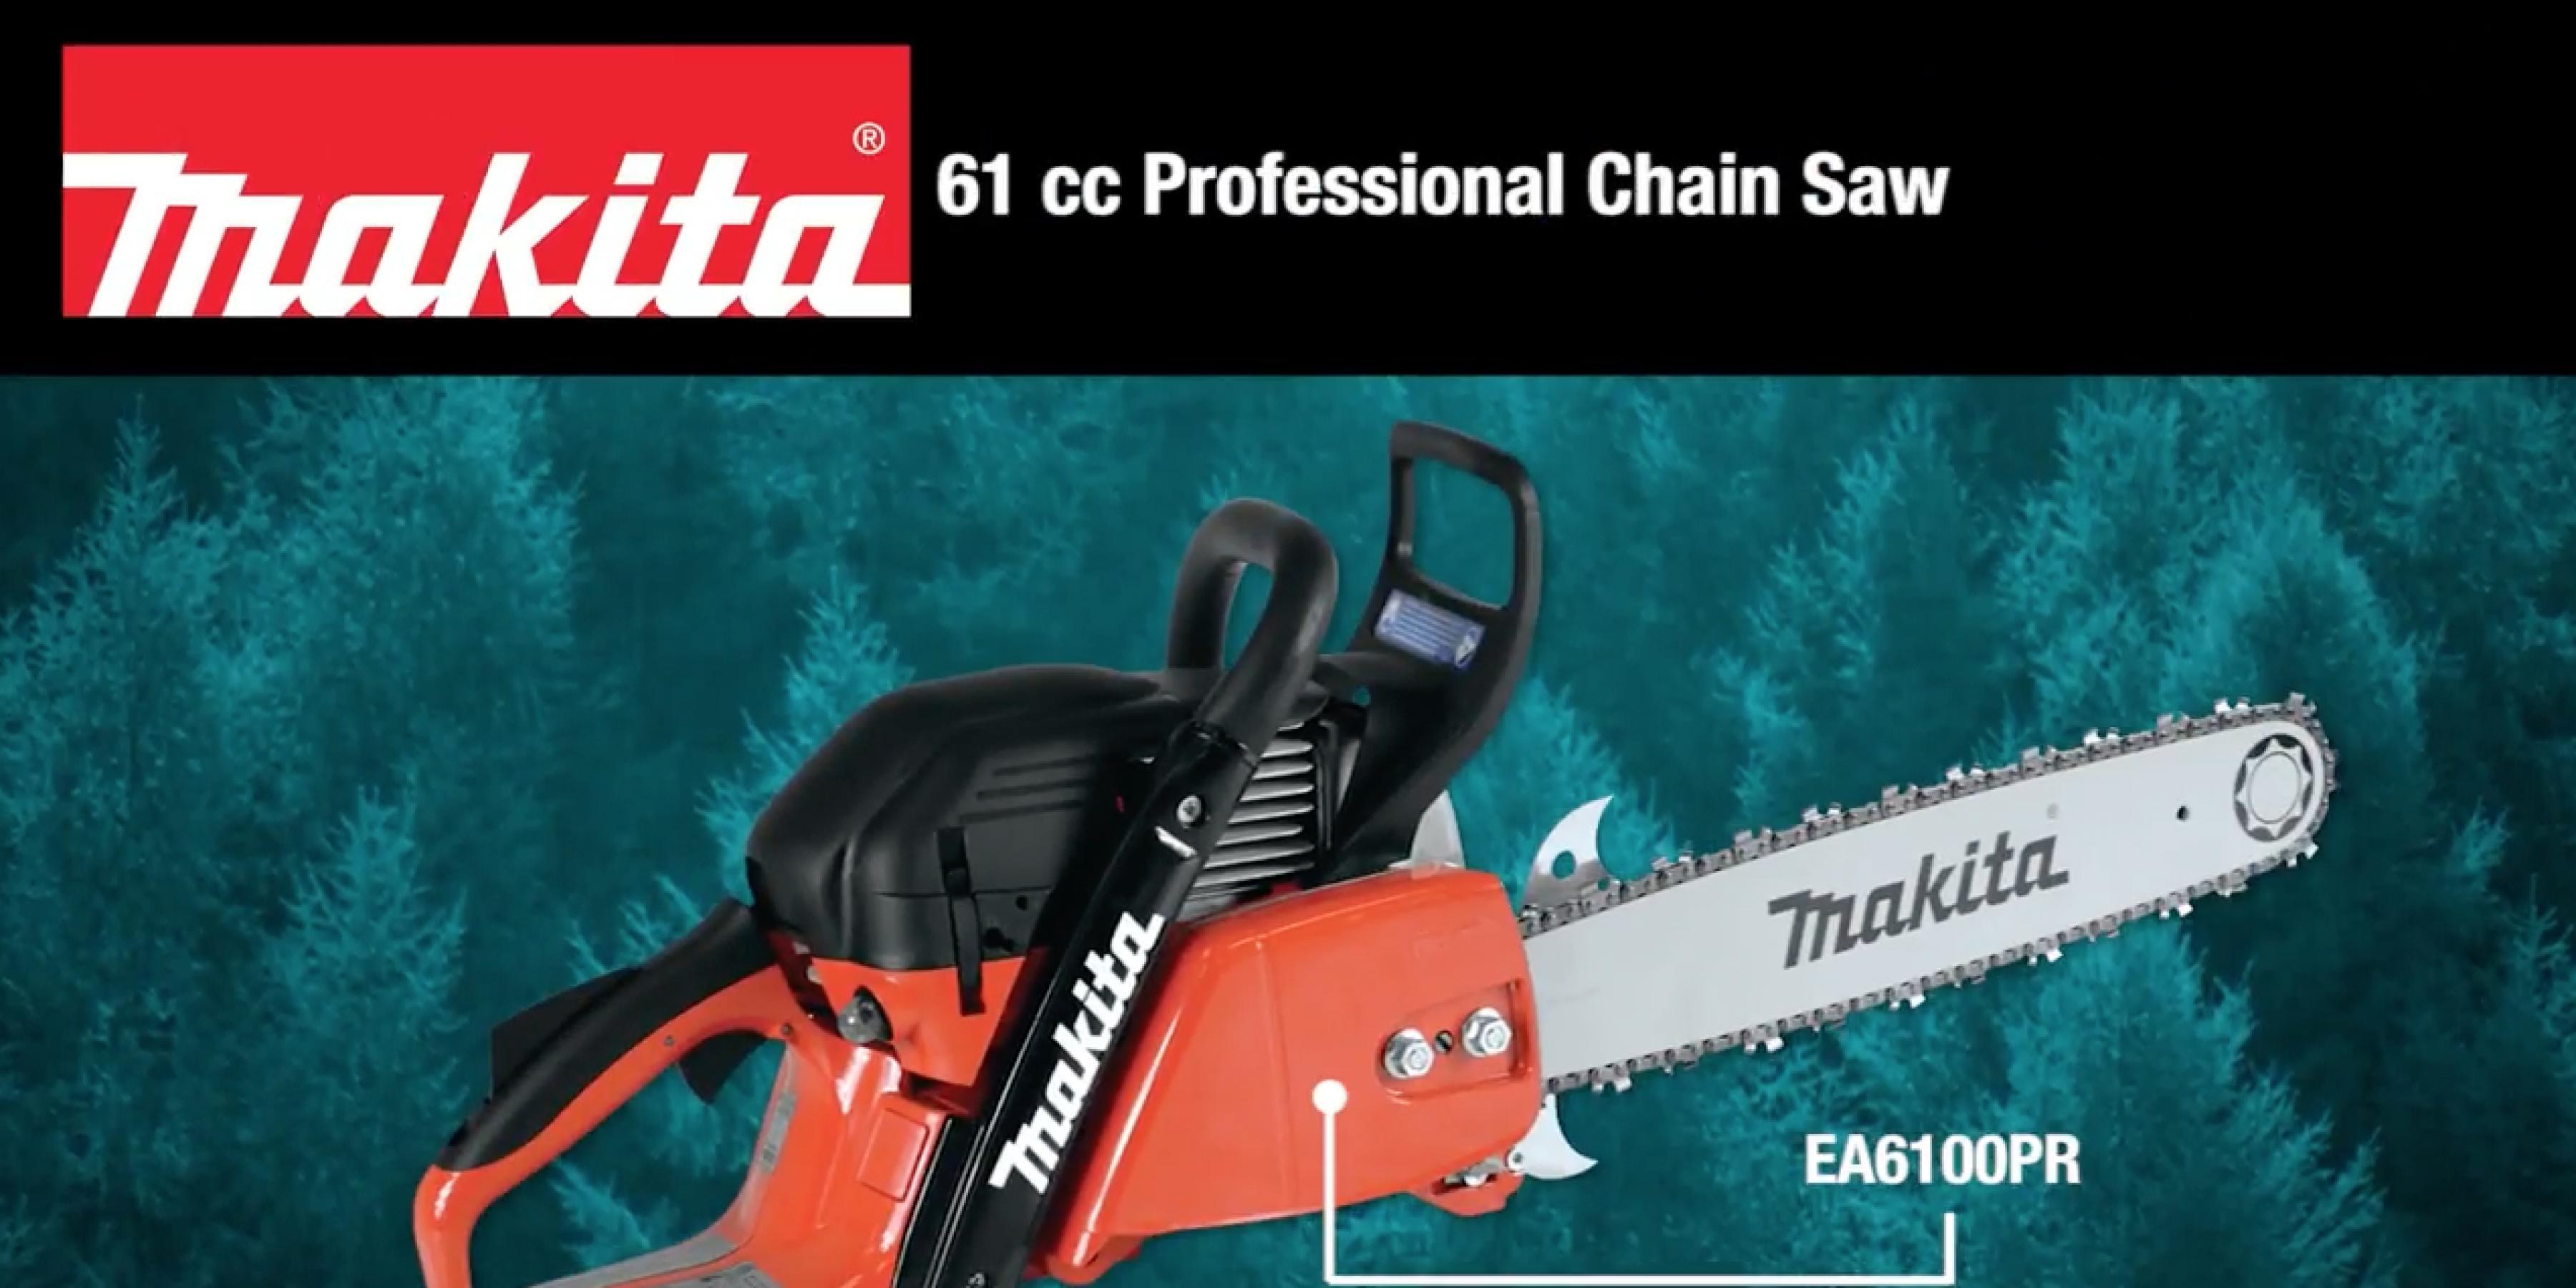 MAKITA 61 cc Professional Chain Saw (EA6100PR)